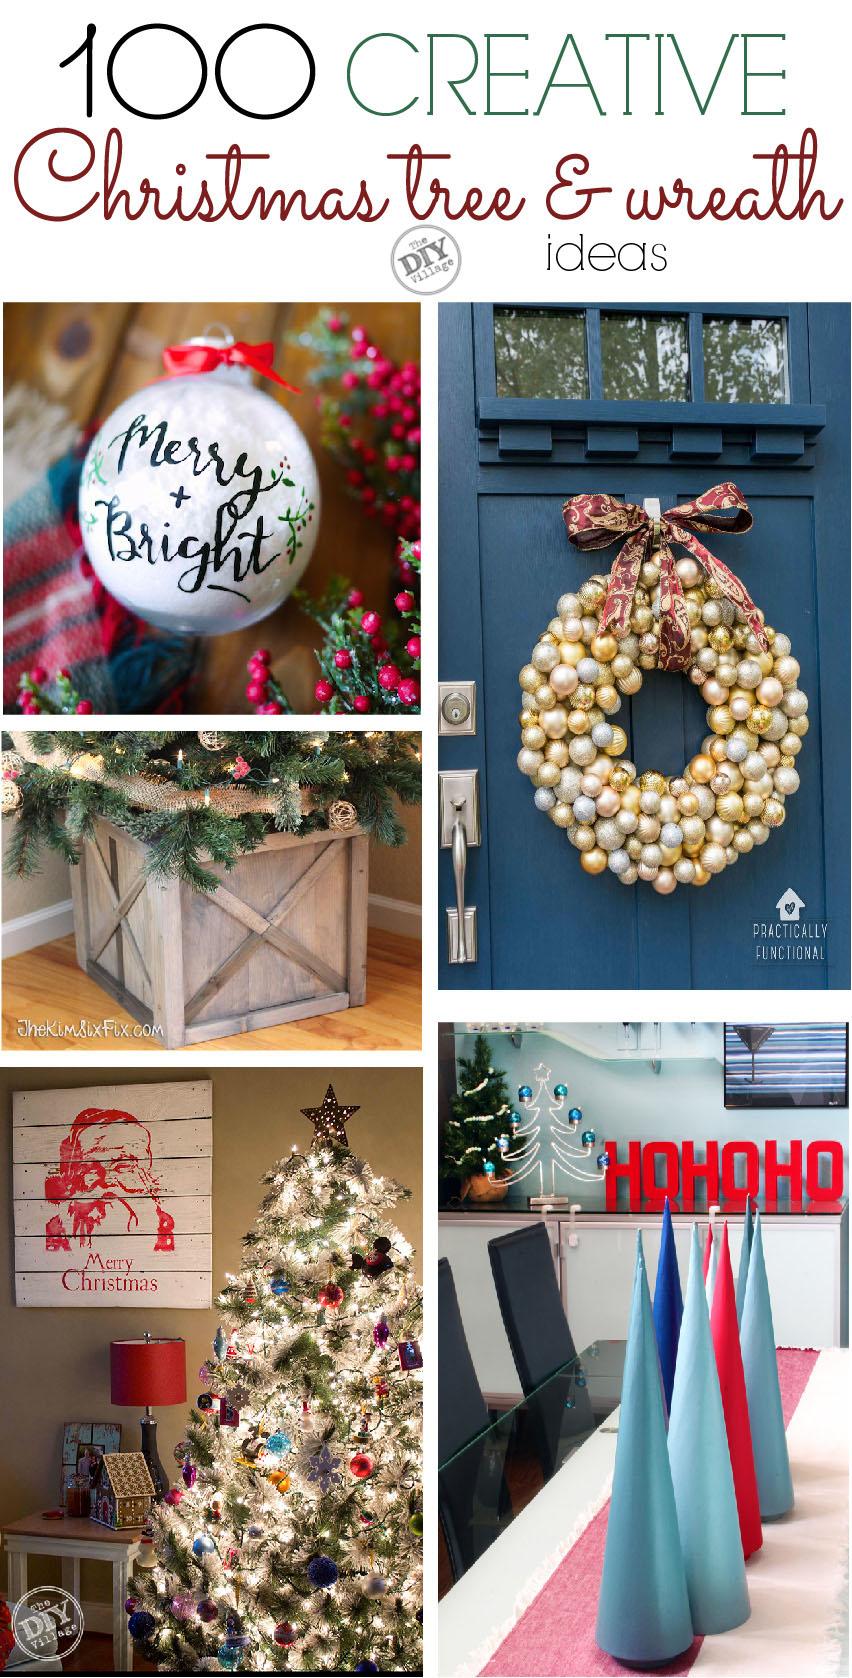 100 creative Christmas tree and wreath ideas for everyone. #christmas #decor #wreath #ChristmasTree